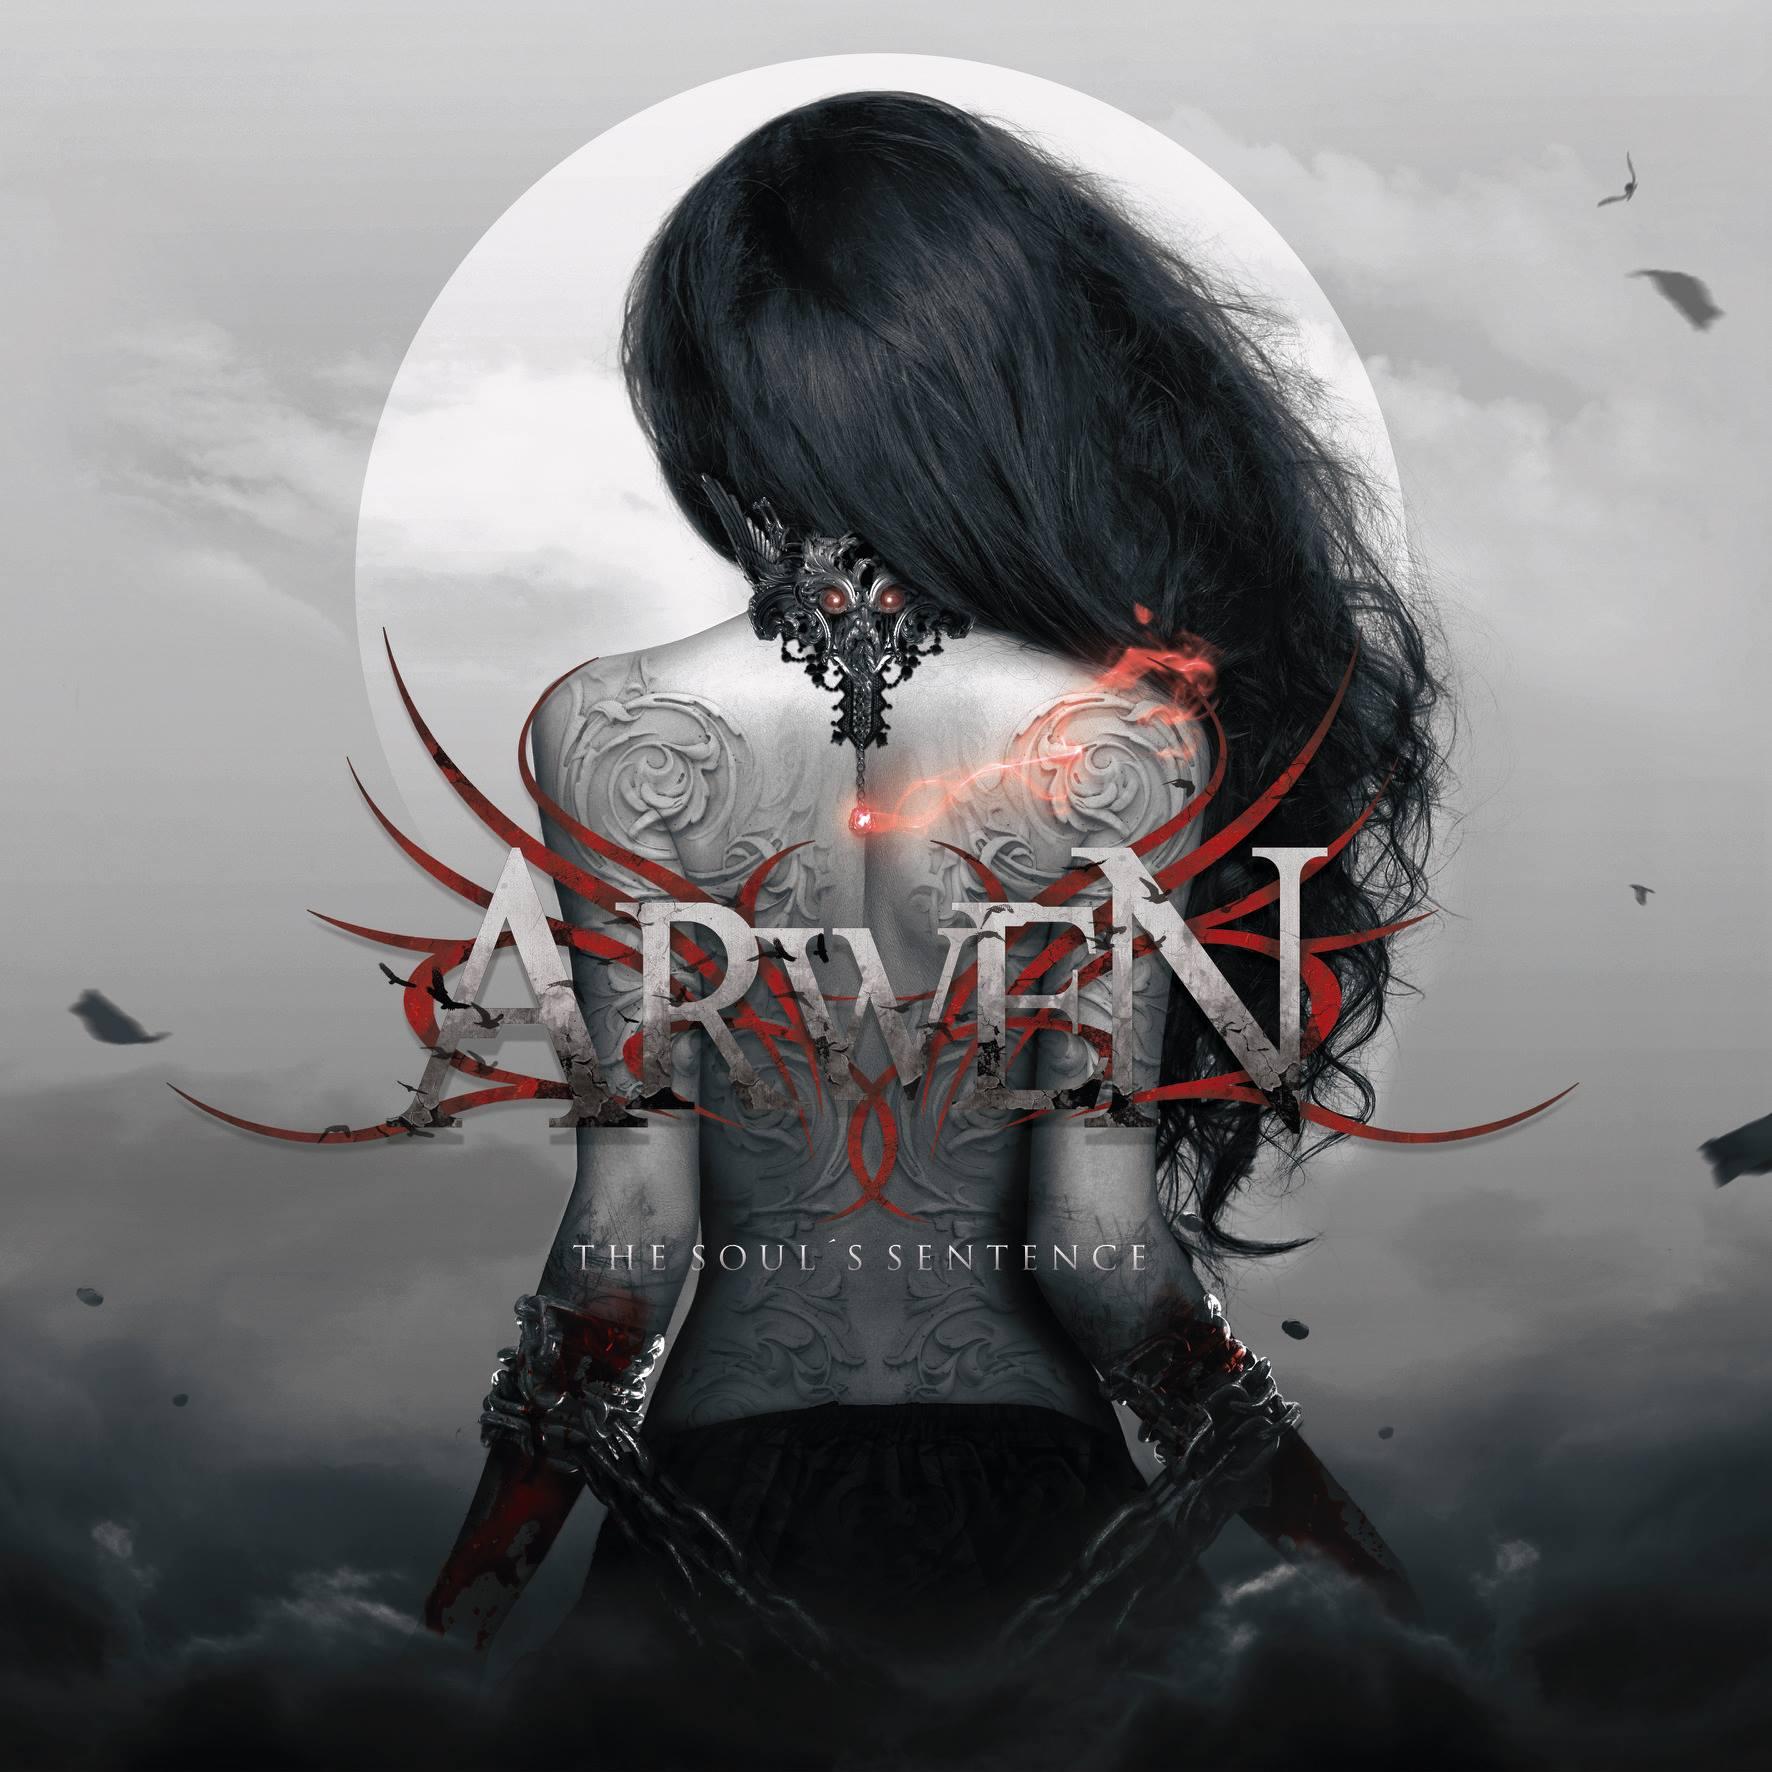 the souls sentence arwen